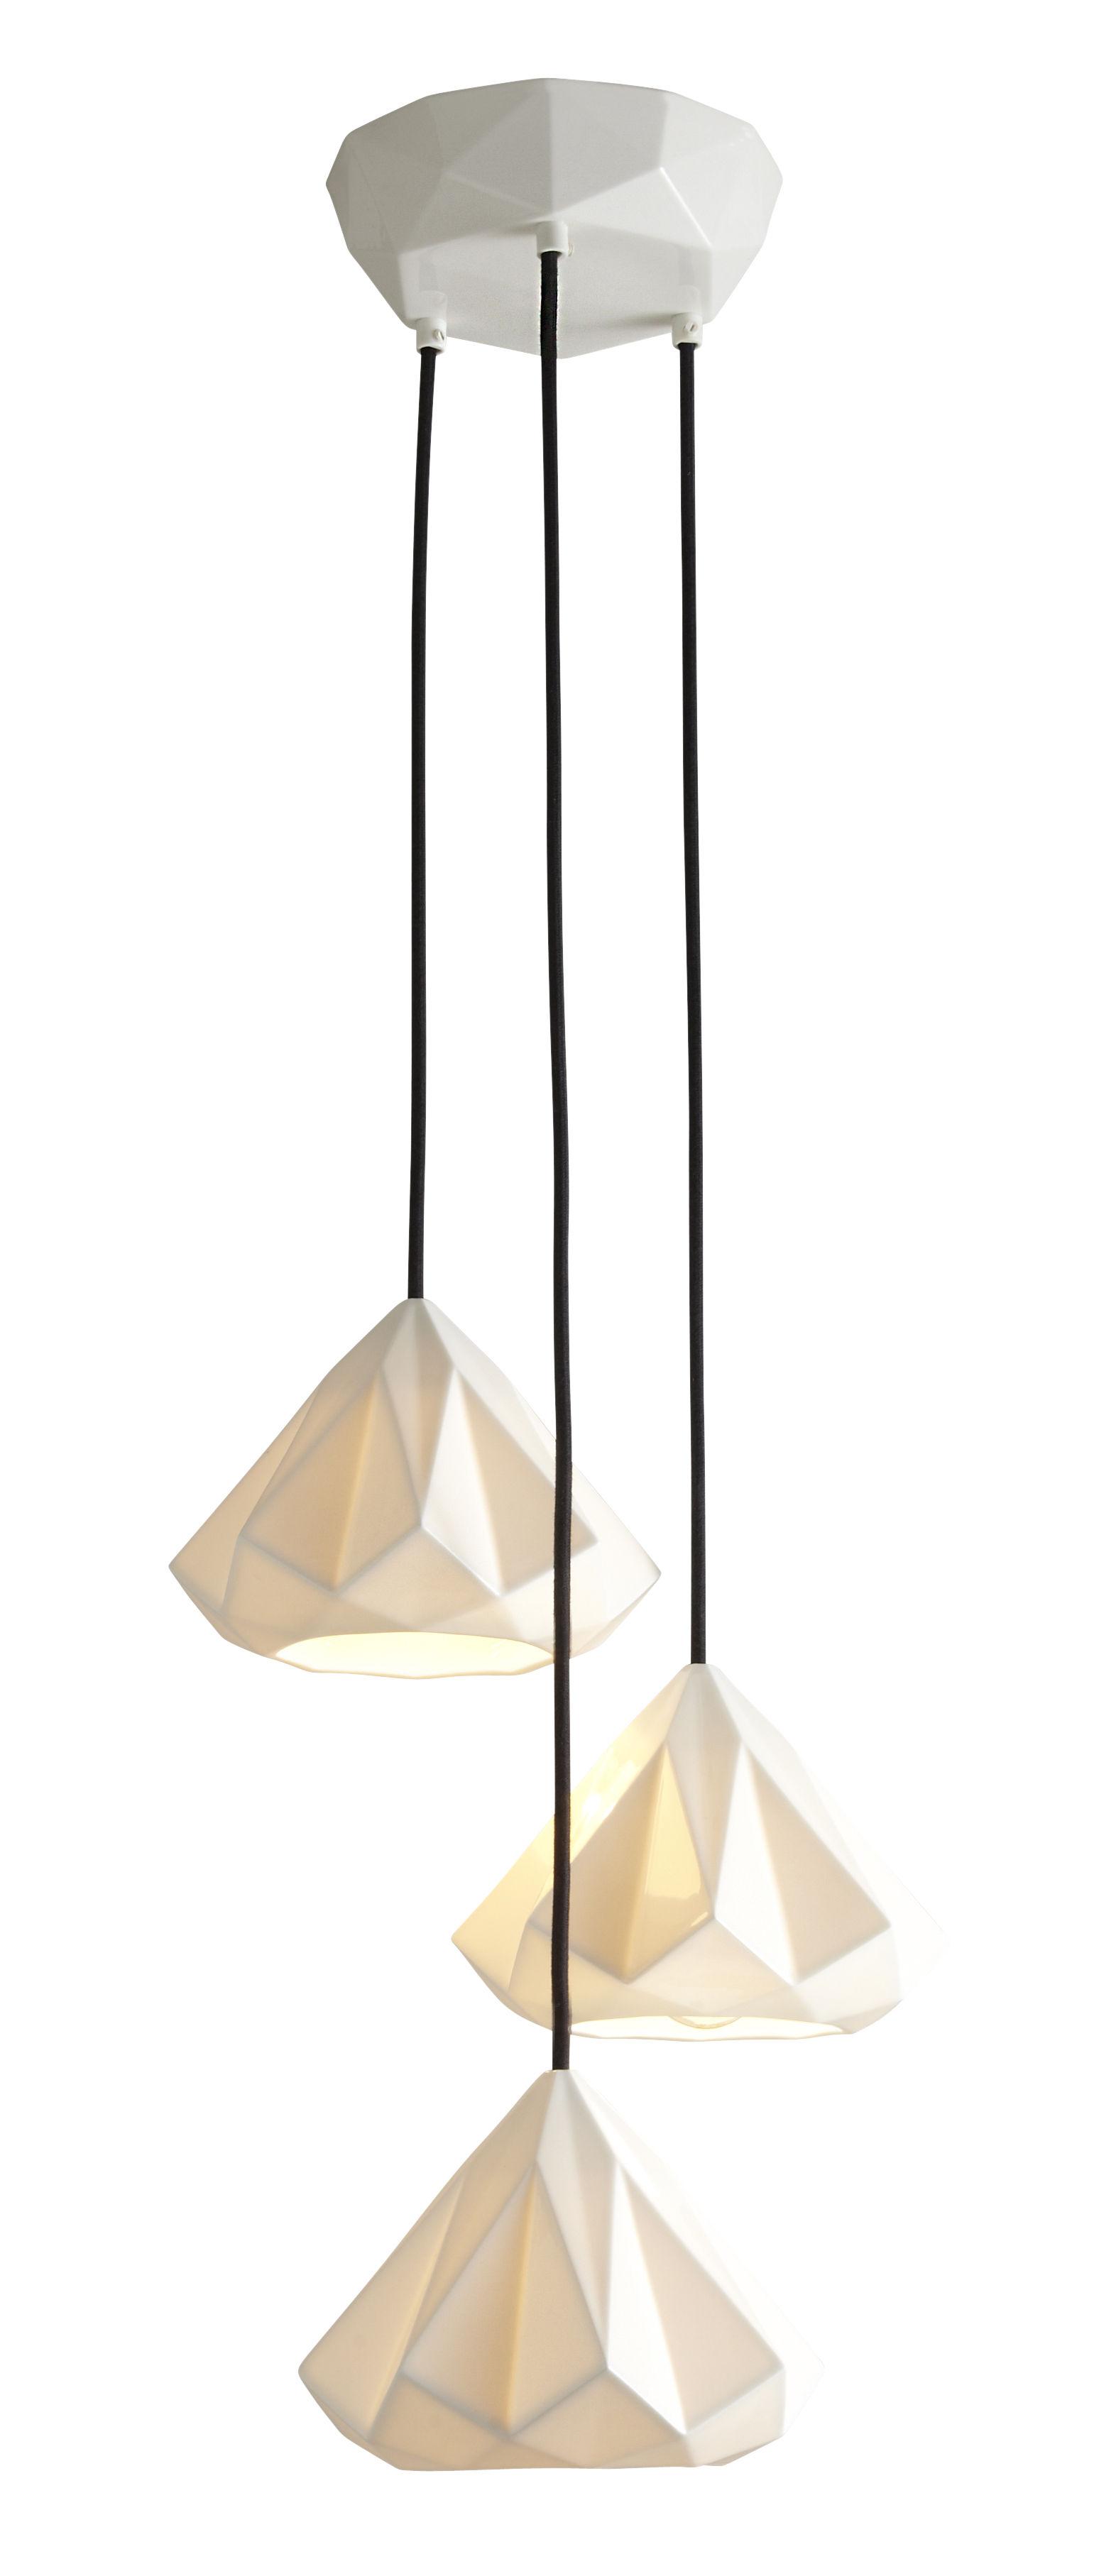 Illuminazione - Lampadari - Sospensione Hatton 1 - / Set 3 paralumi - Porcellana di Original BTC - Porcellana bianca - Porcellana